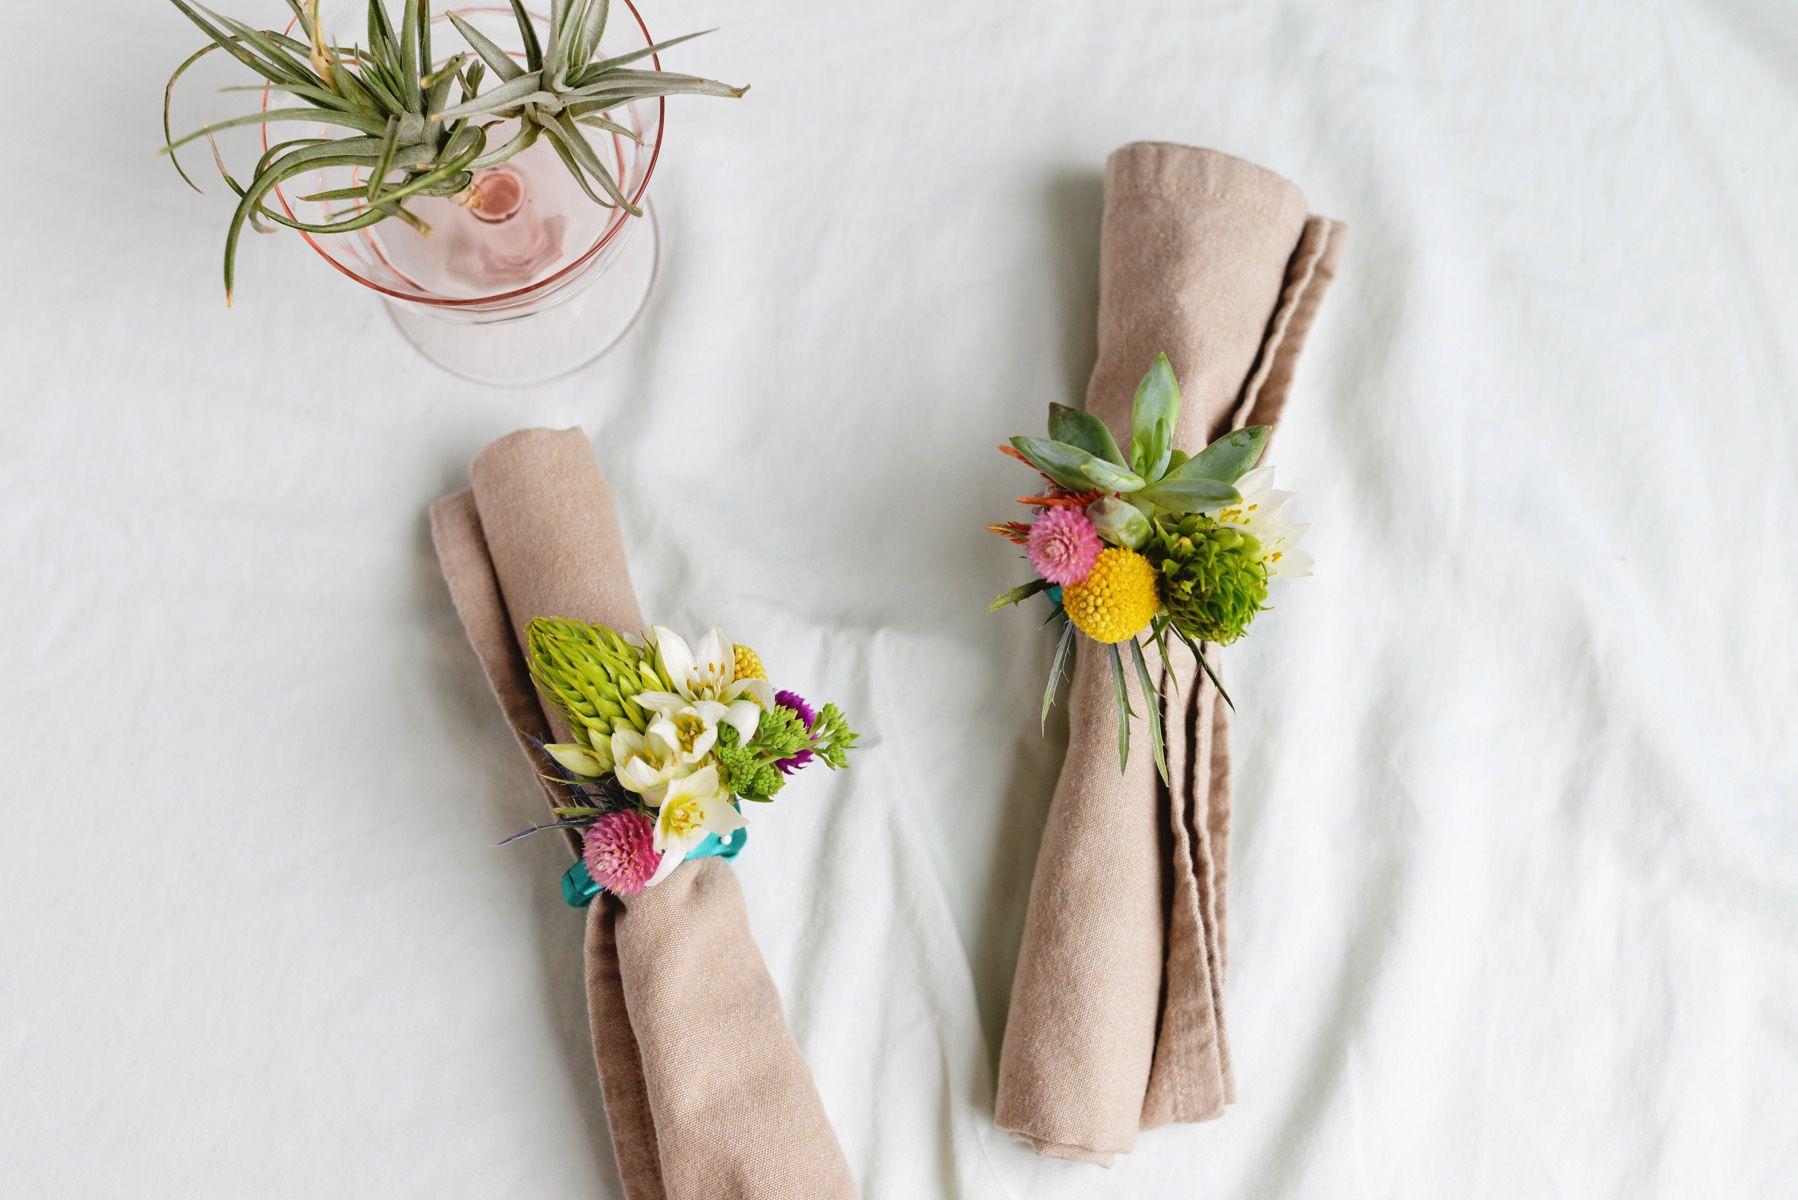 Spring-inspired napkin rings